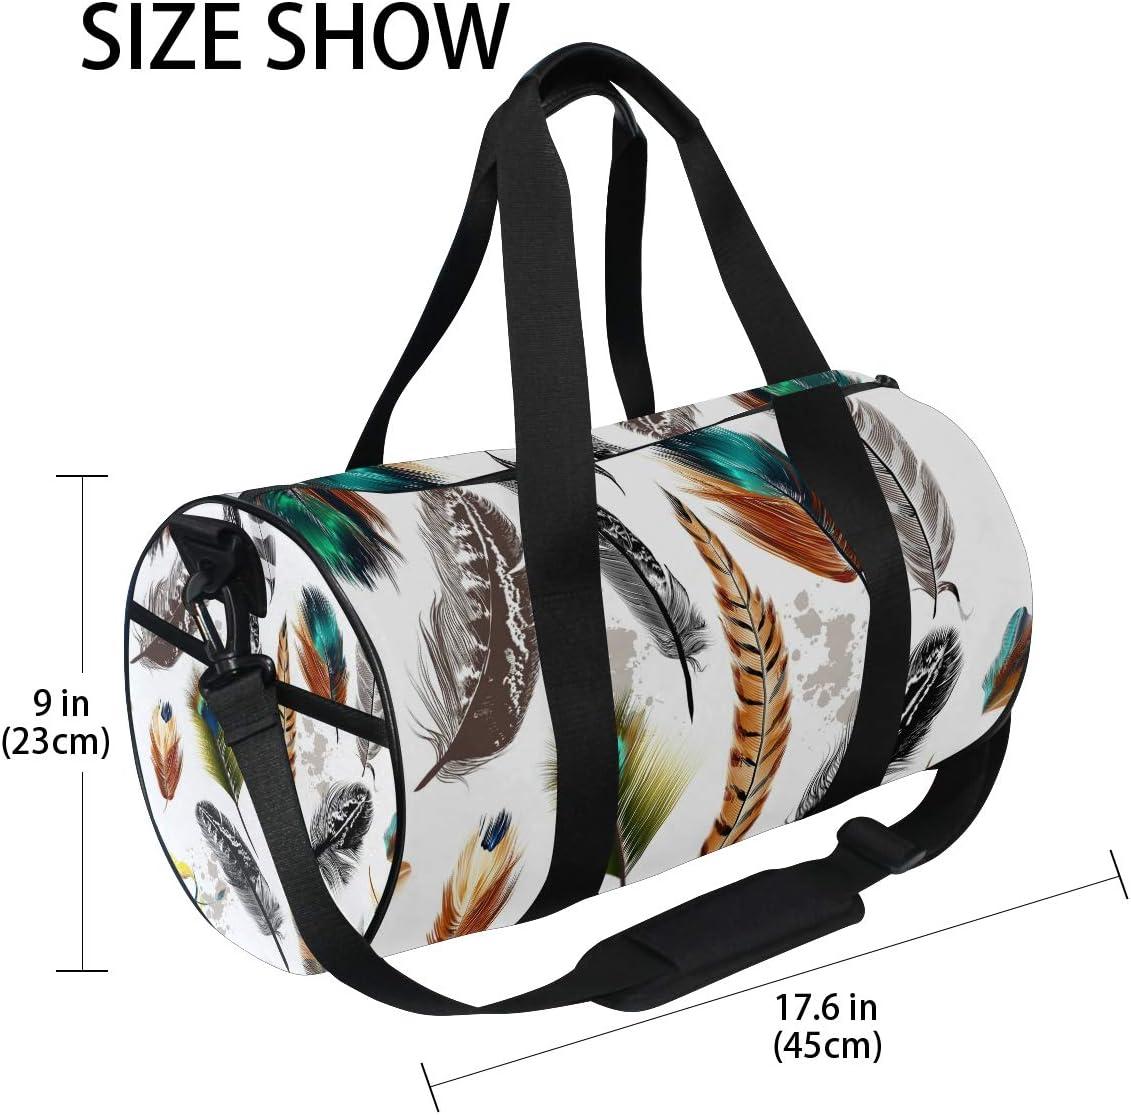 MALPLENA Beautiful Feathers Drum gym duffel bag women Travel Bag